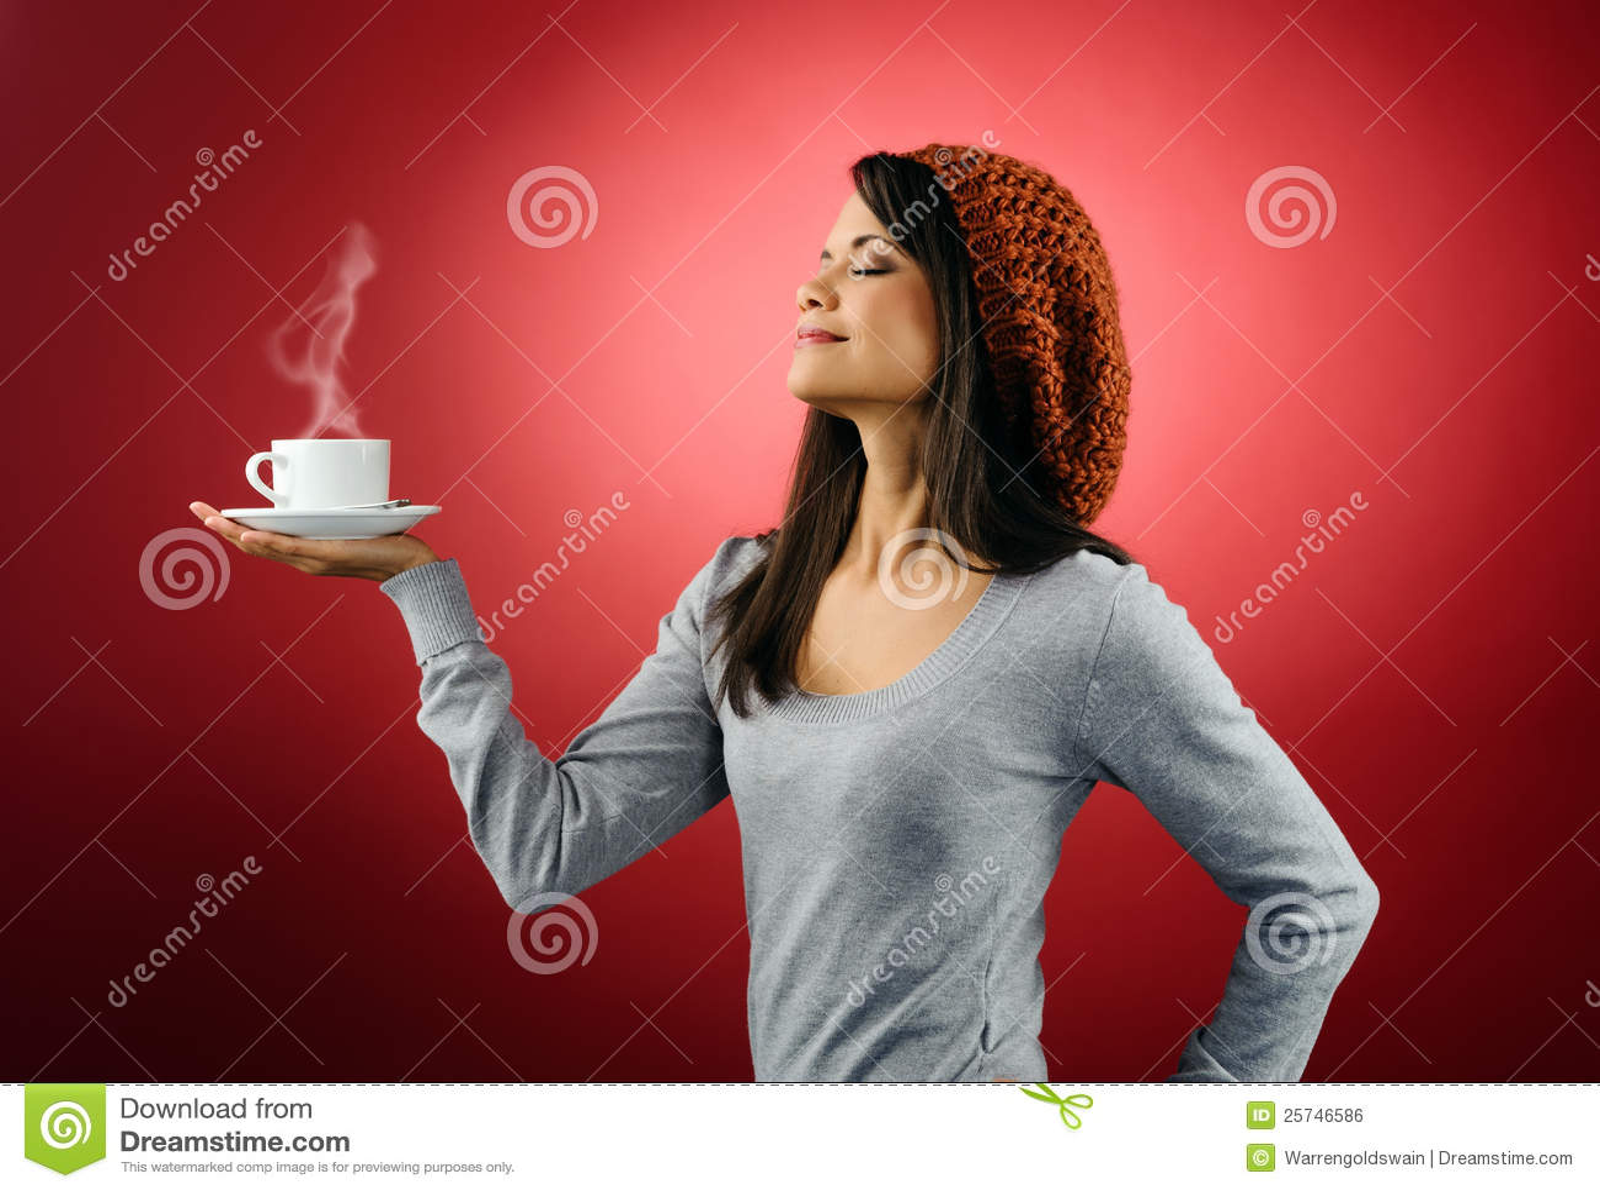 Hot coffee woman